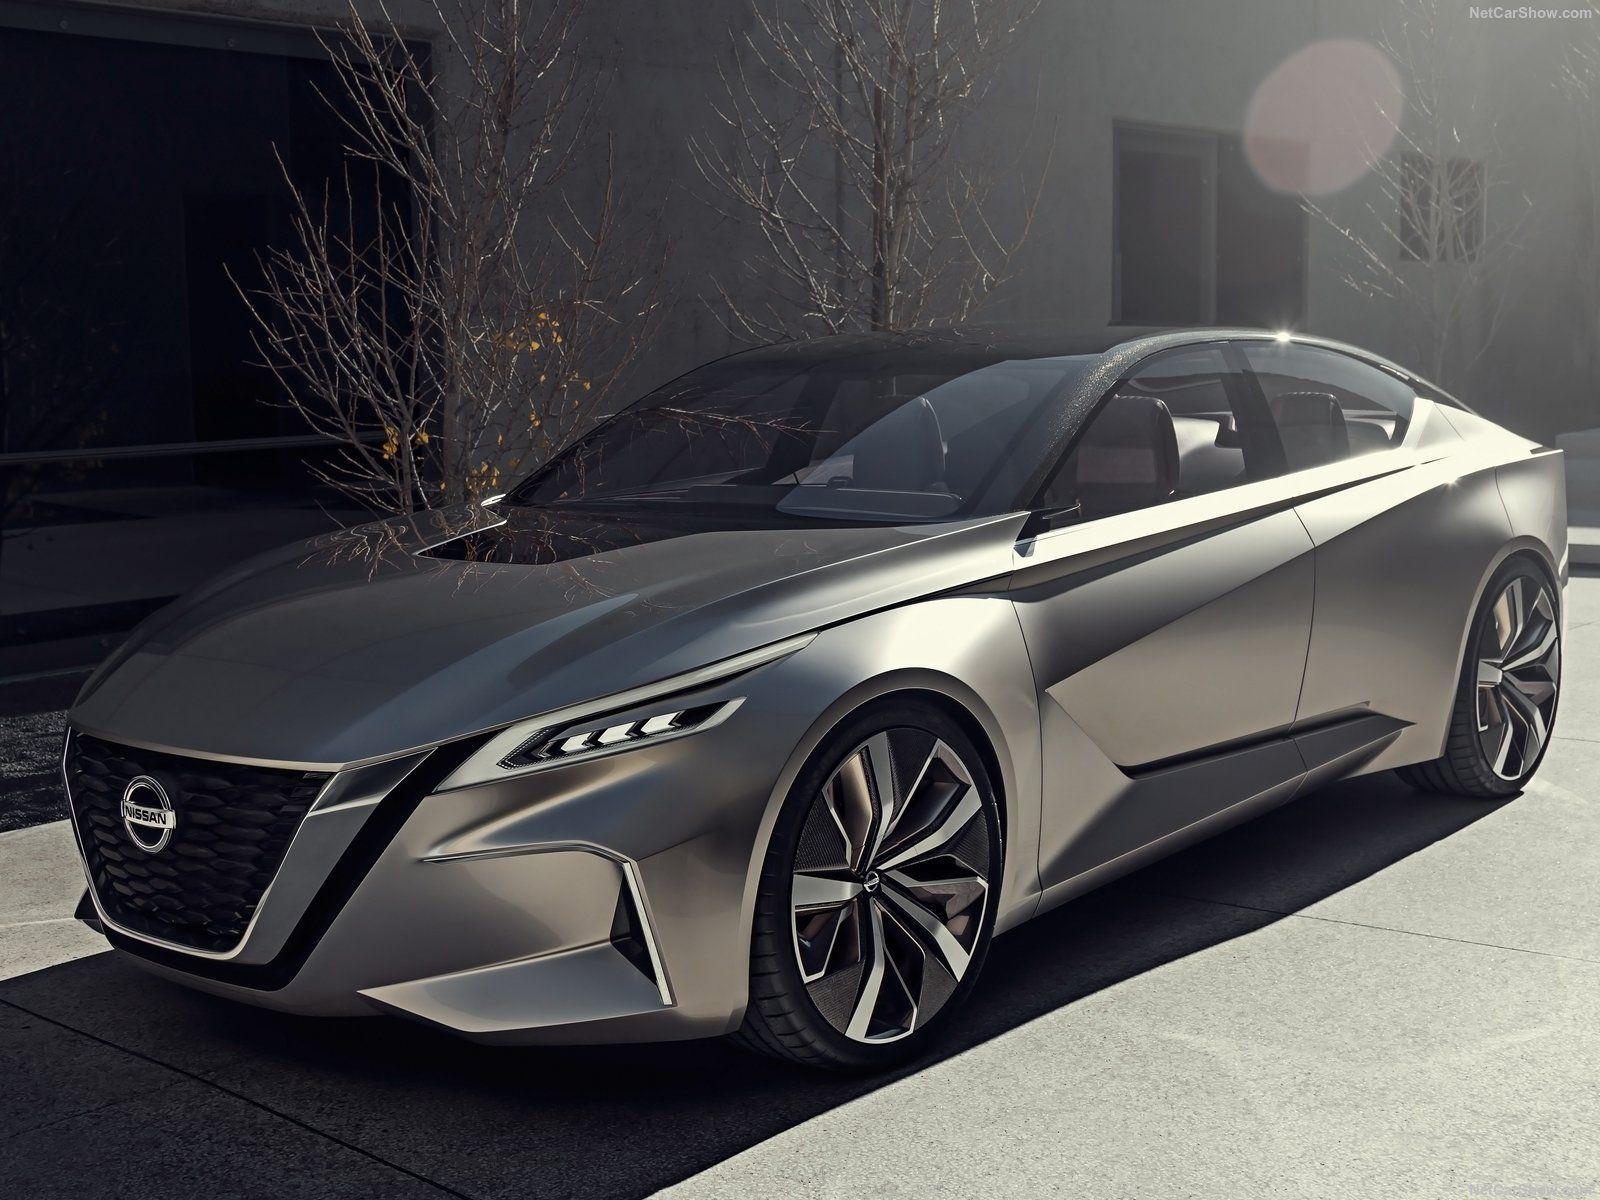 Nissan Vmotion-2.0 Concept 2017 - Новости авторынка.